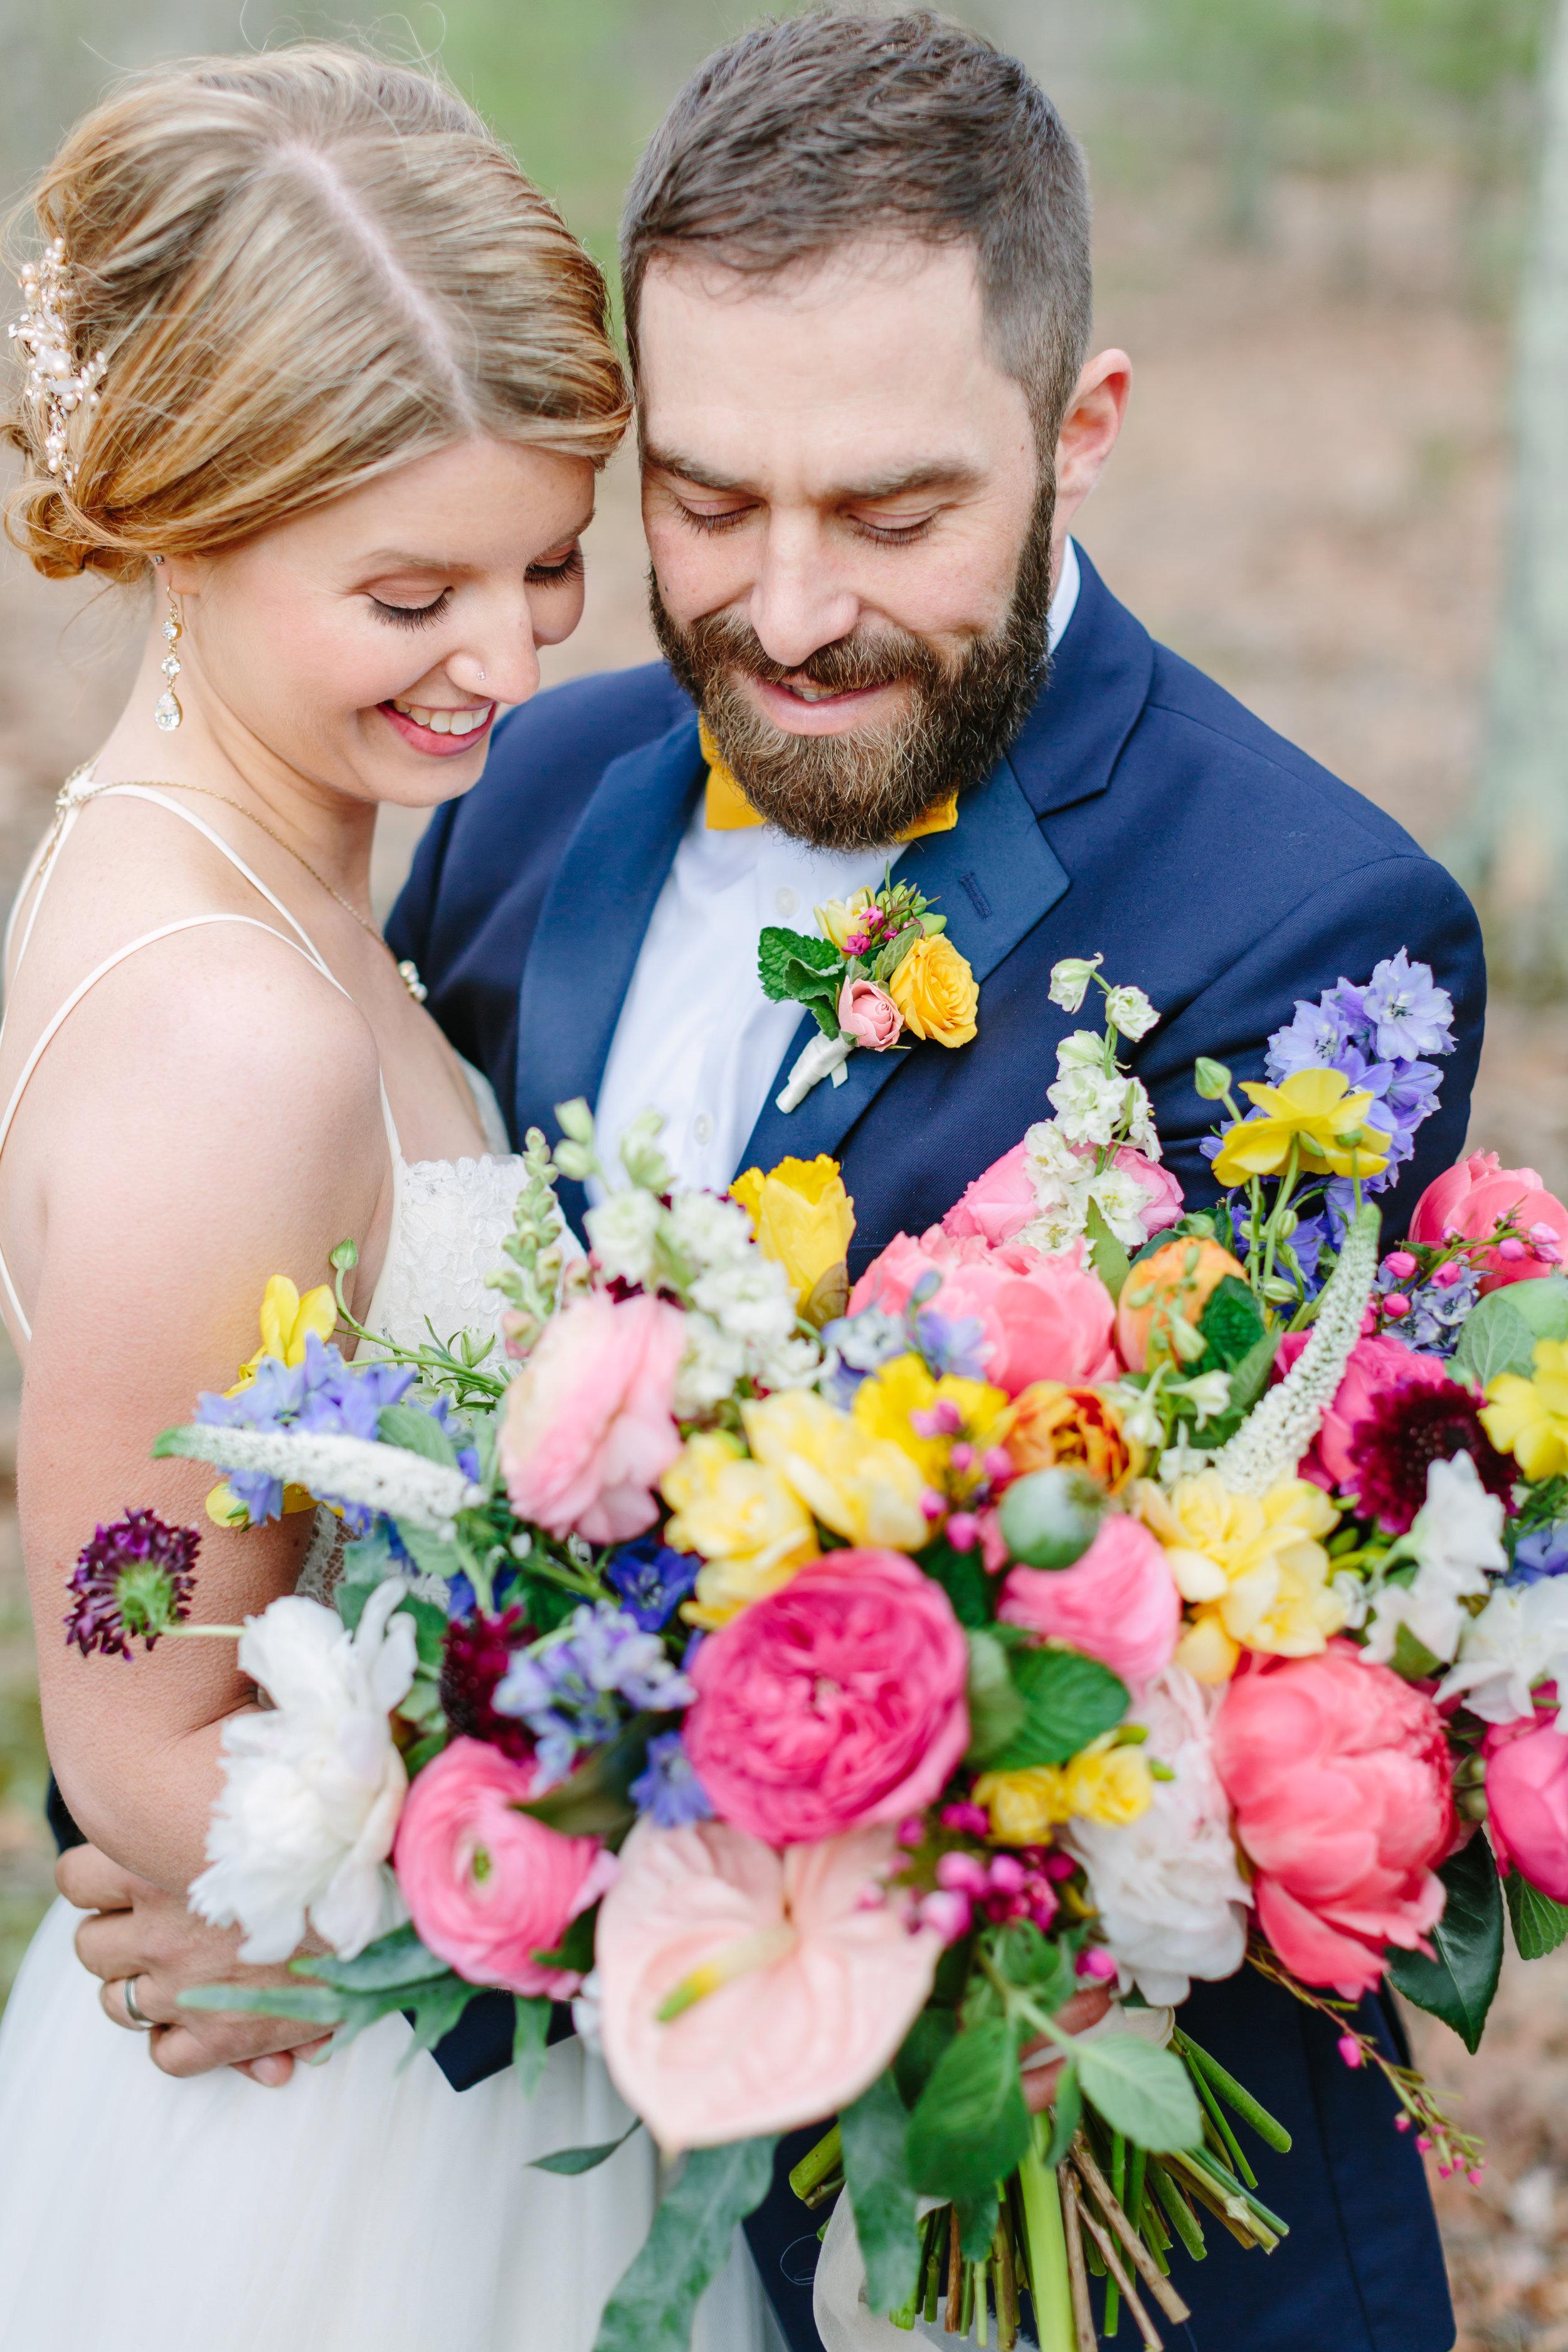 blue_wedding_suit.jpg